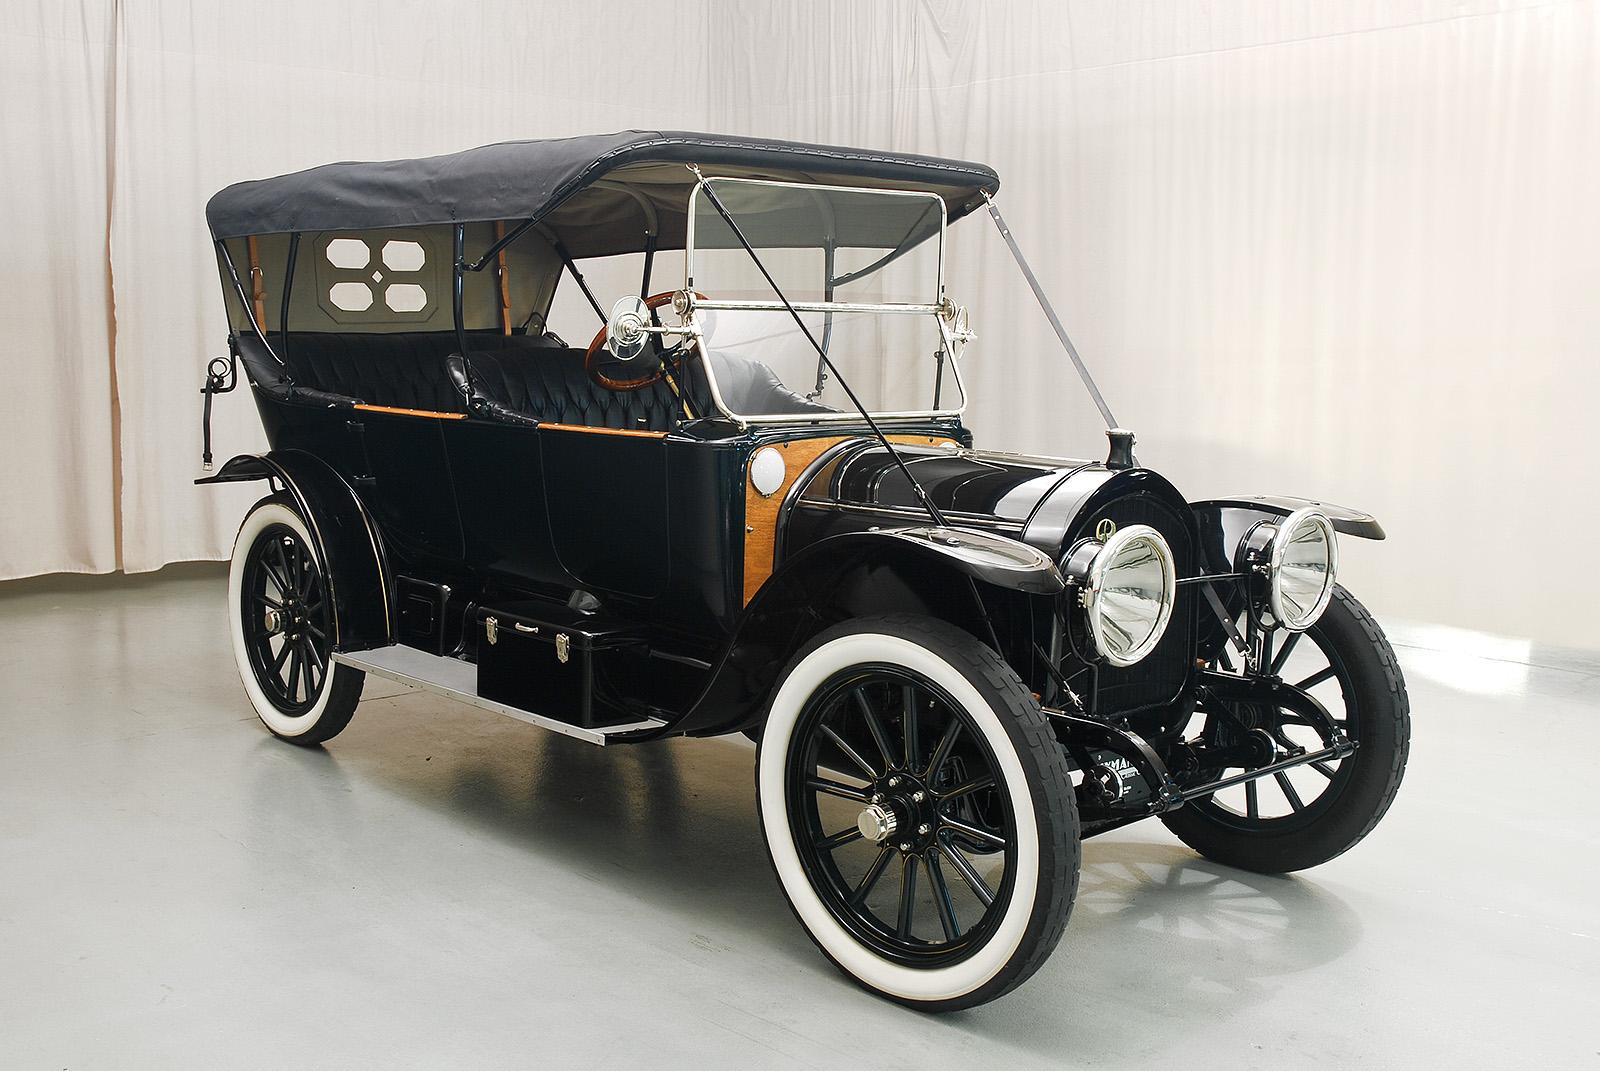 1913 Rambler Model 83 Cross Country Touring Hyman Ltd